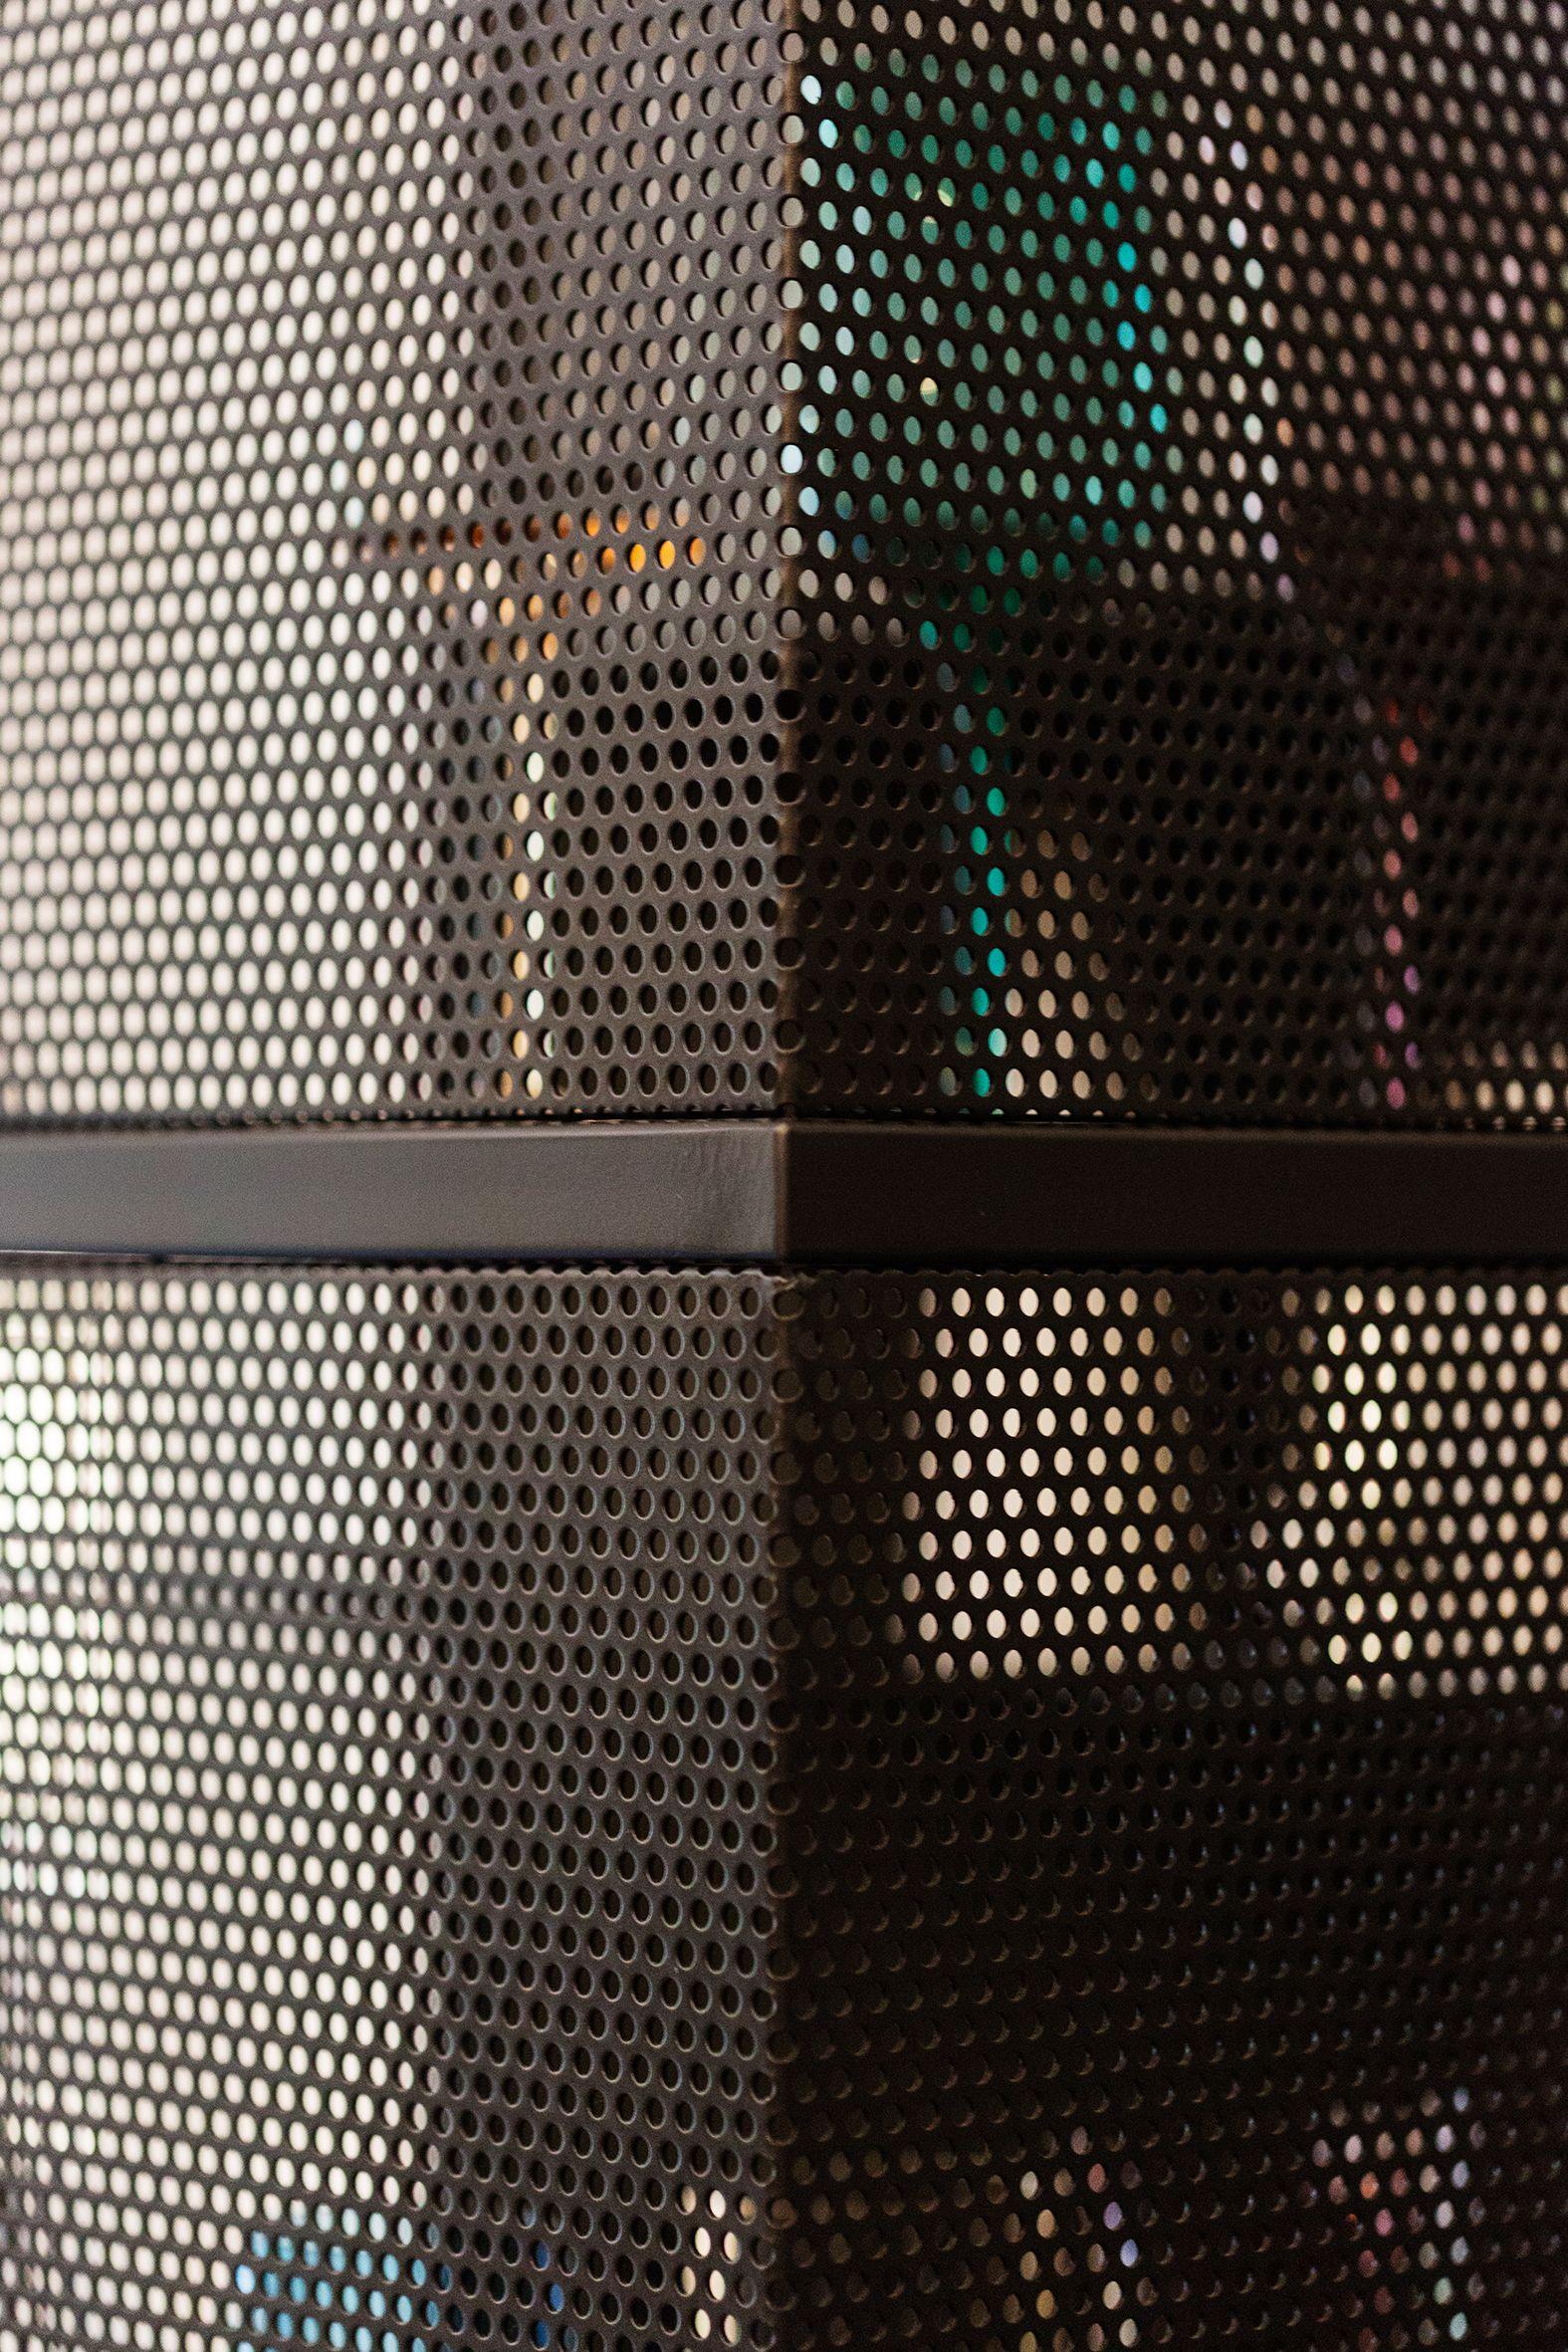 Micro Perforated Steel Painted Matt Black By A3lier Design Fabrizio Fobert Architect Black Metal Desk Urban Industrial Decor Steel Cage